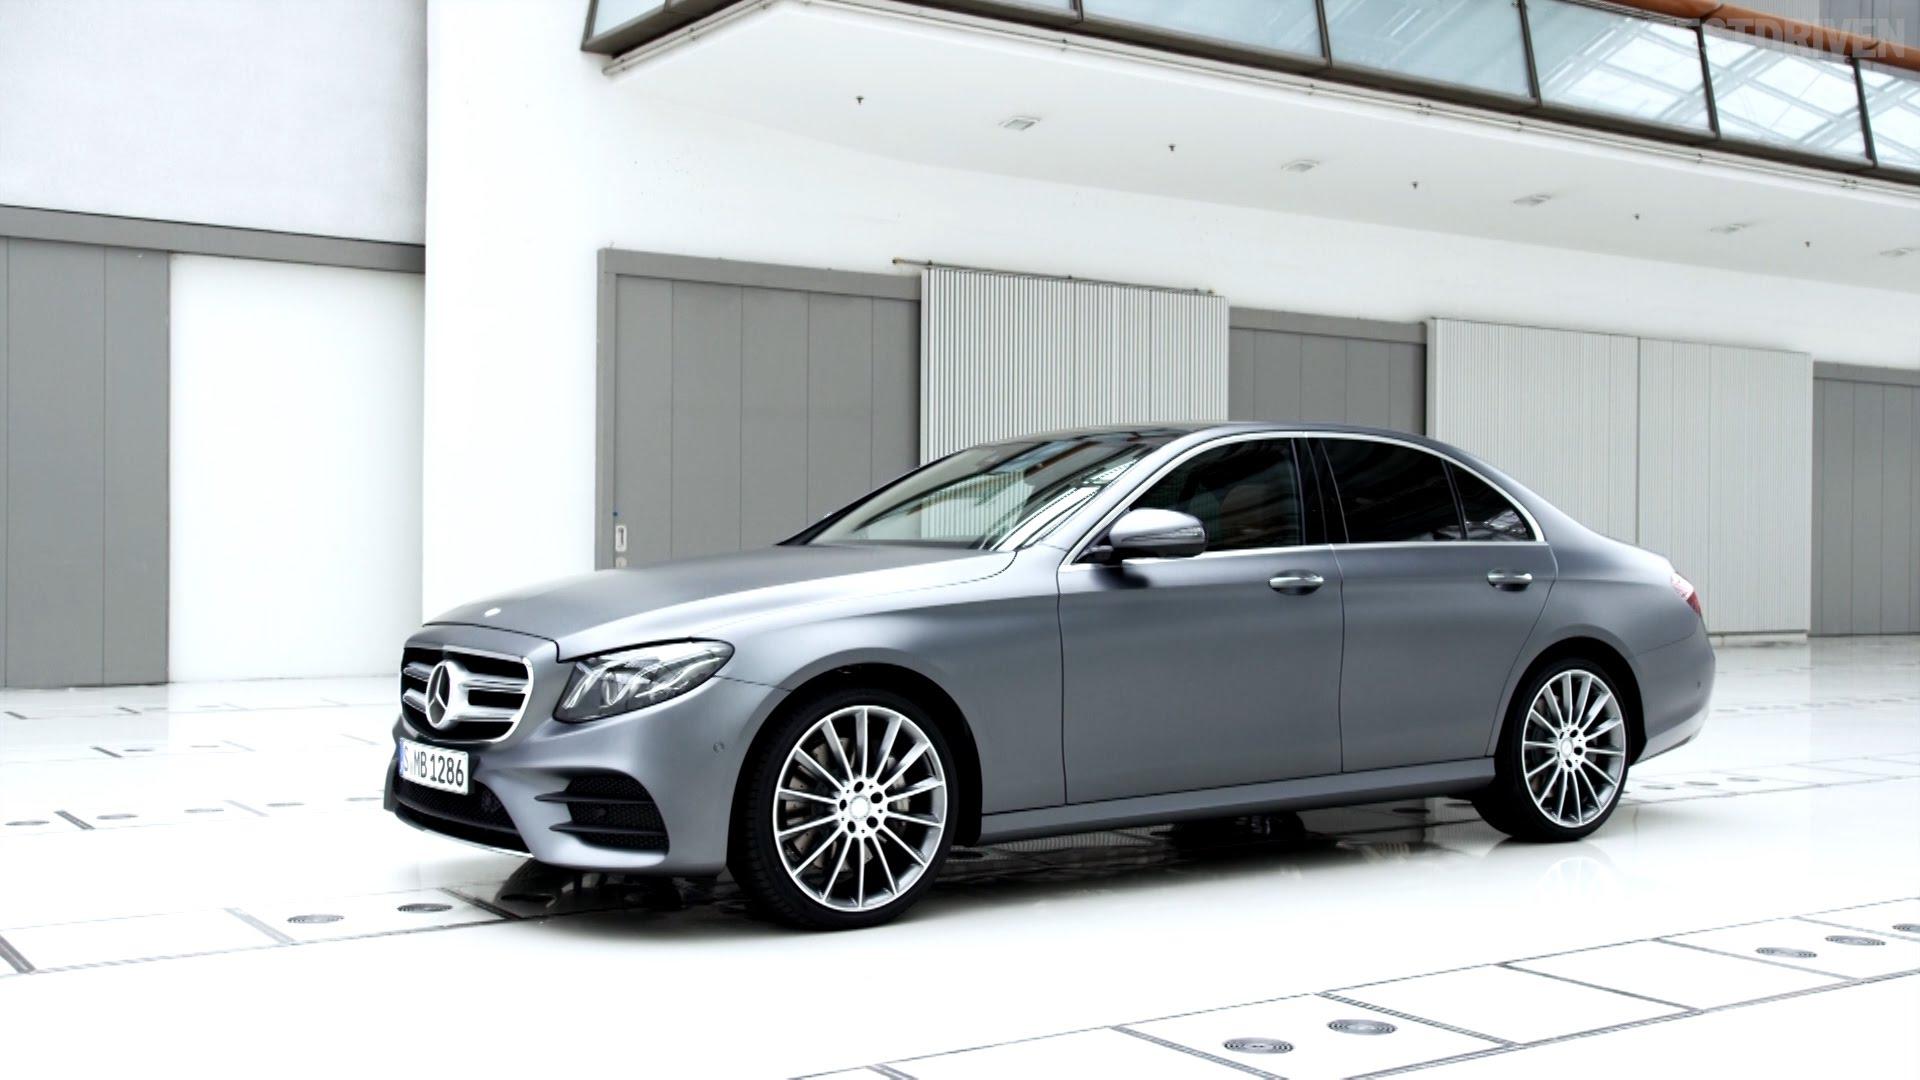 2017Auto___Mercedes-Benz_Silver_Mercedes